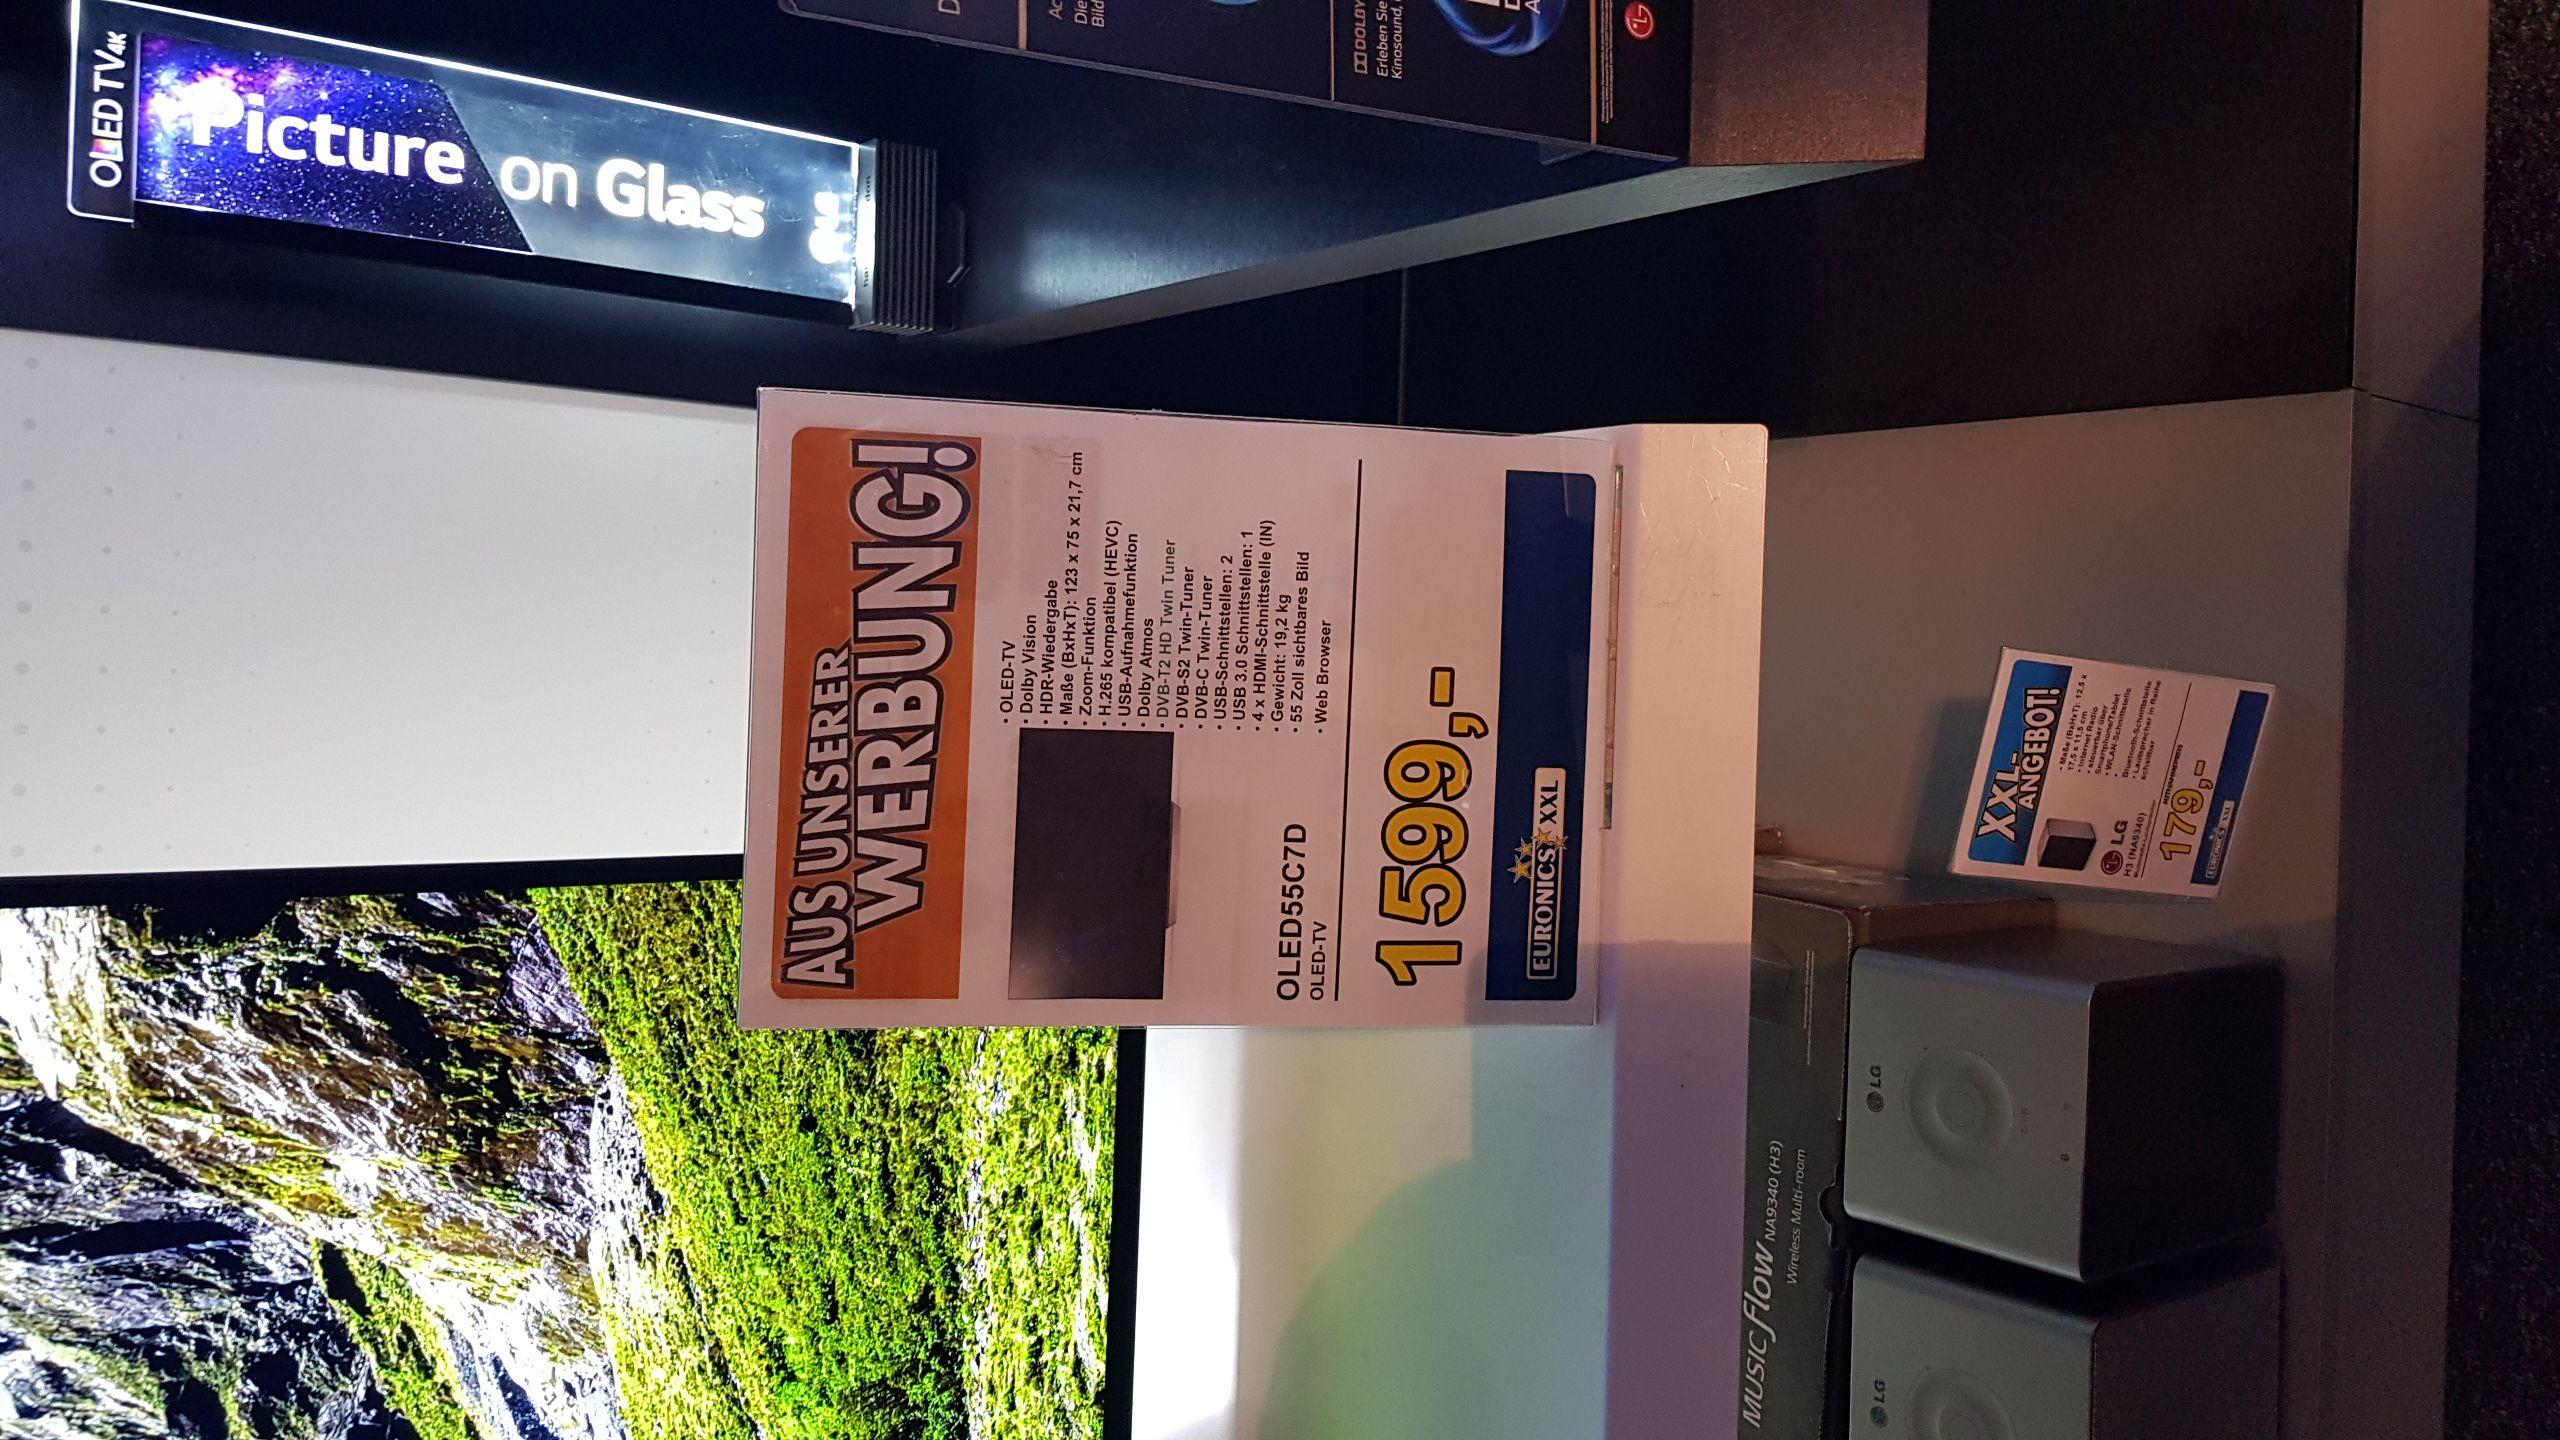 [Lokal] LG OLED 55 C7 (139cm, Dolby Atmos, OLED)